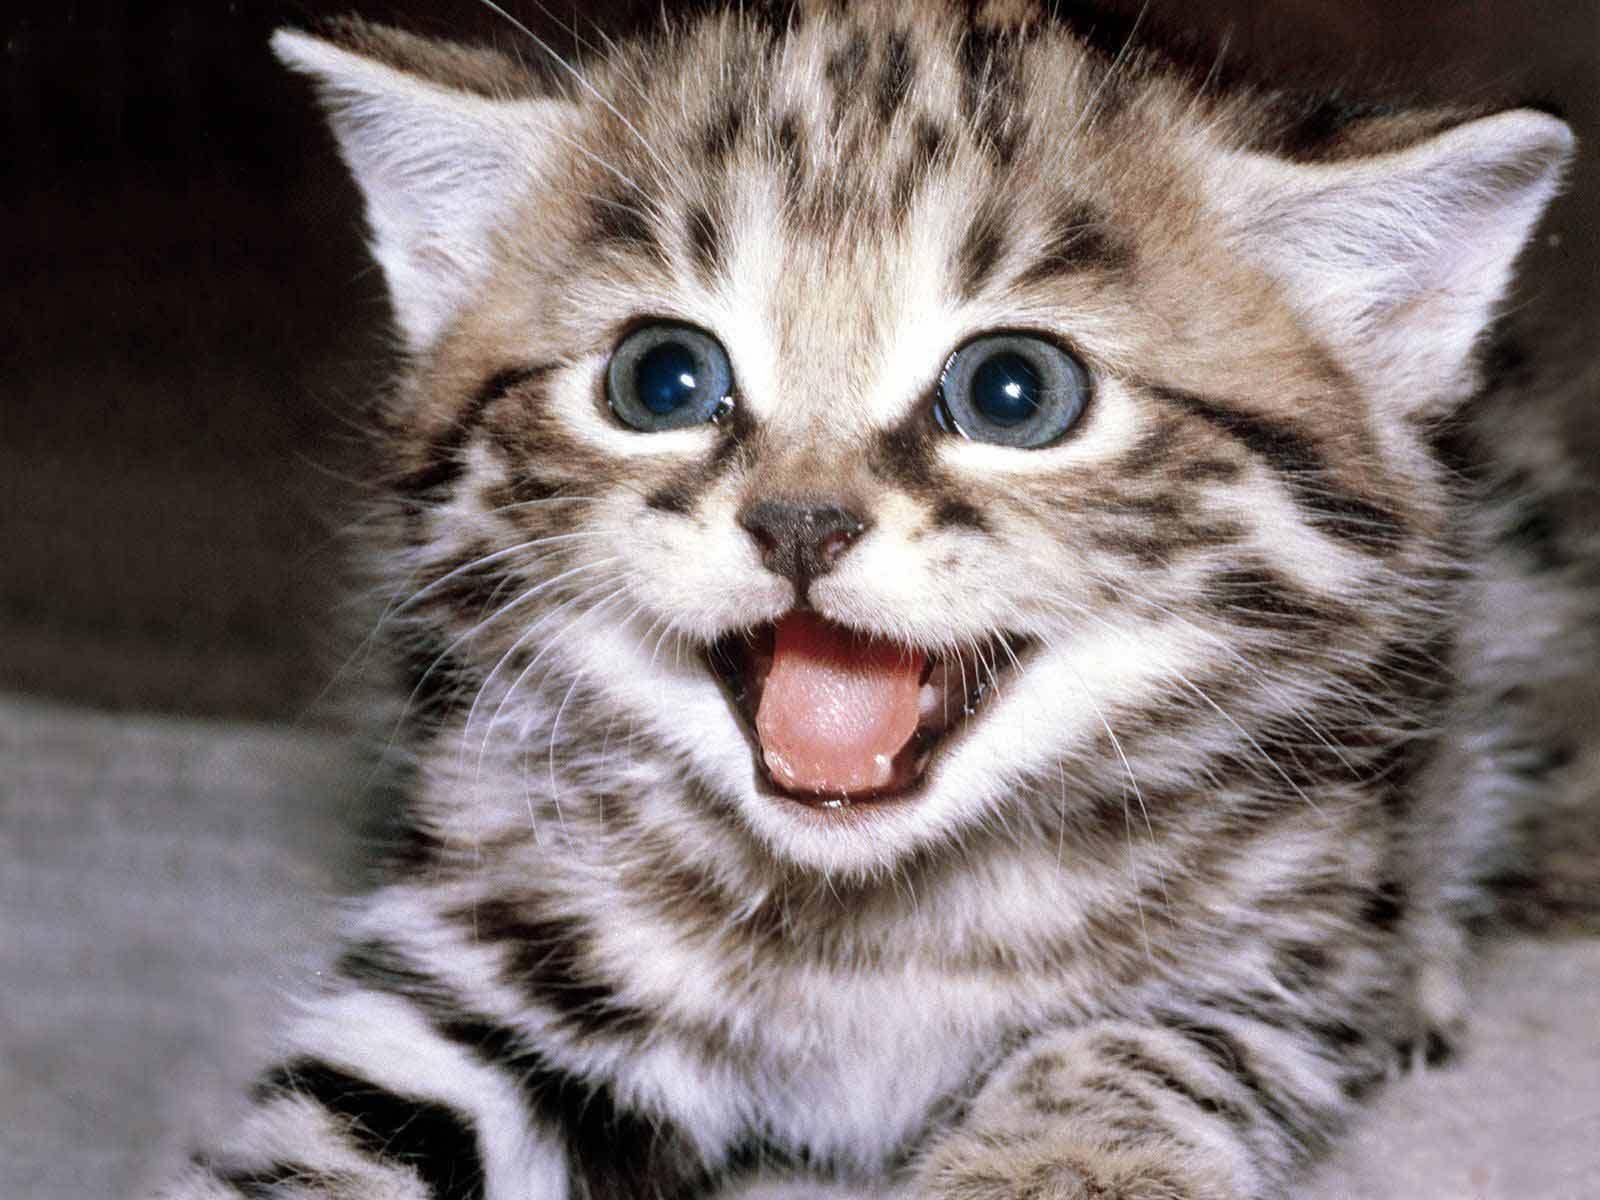 Cute Wallpapers   Cute Kittens Wallpaper 10501757 1600x1200